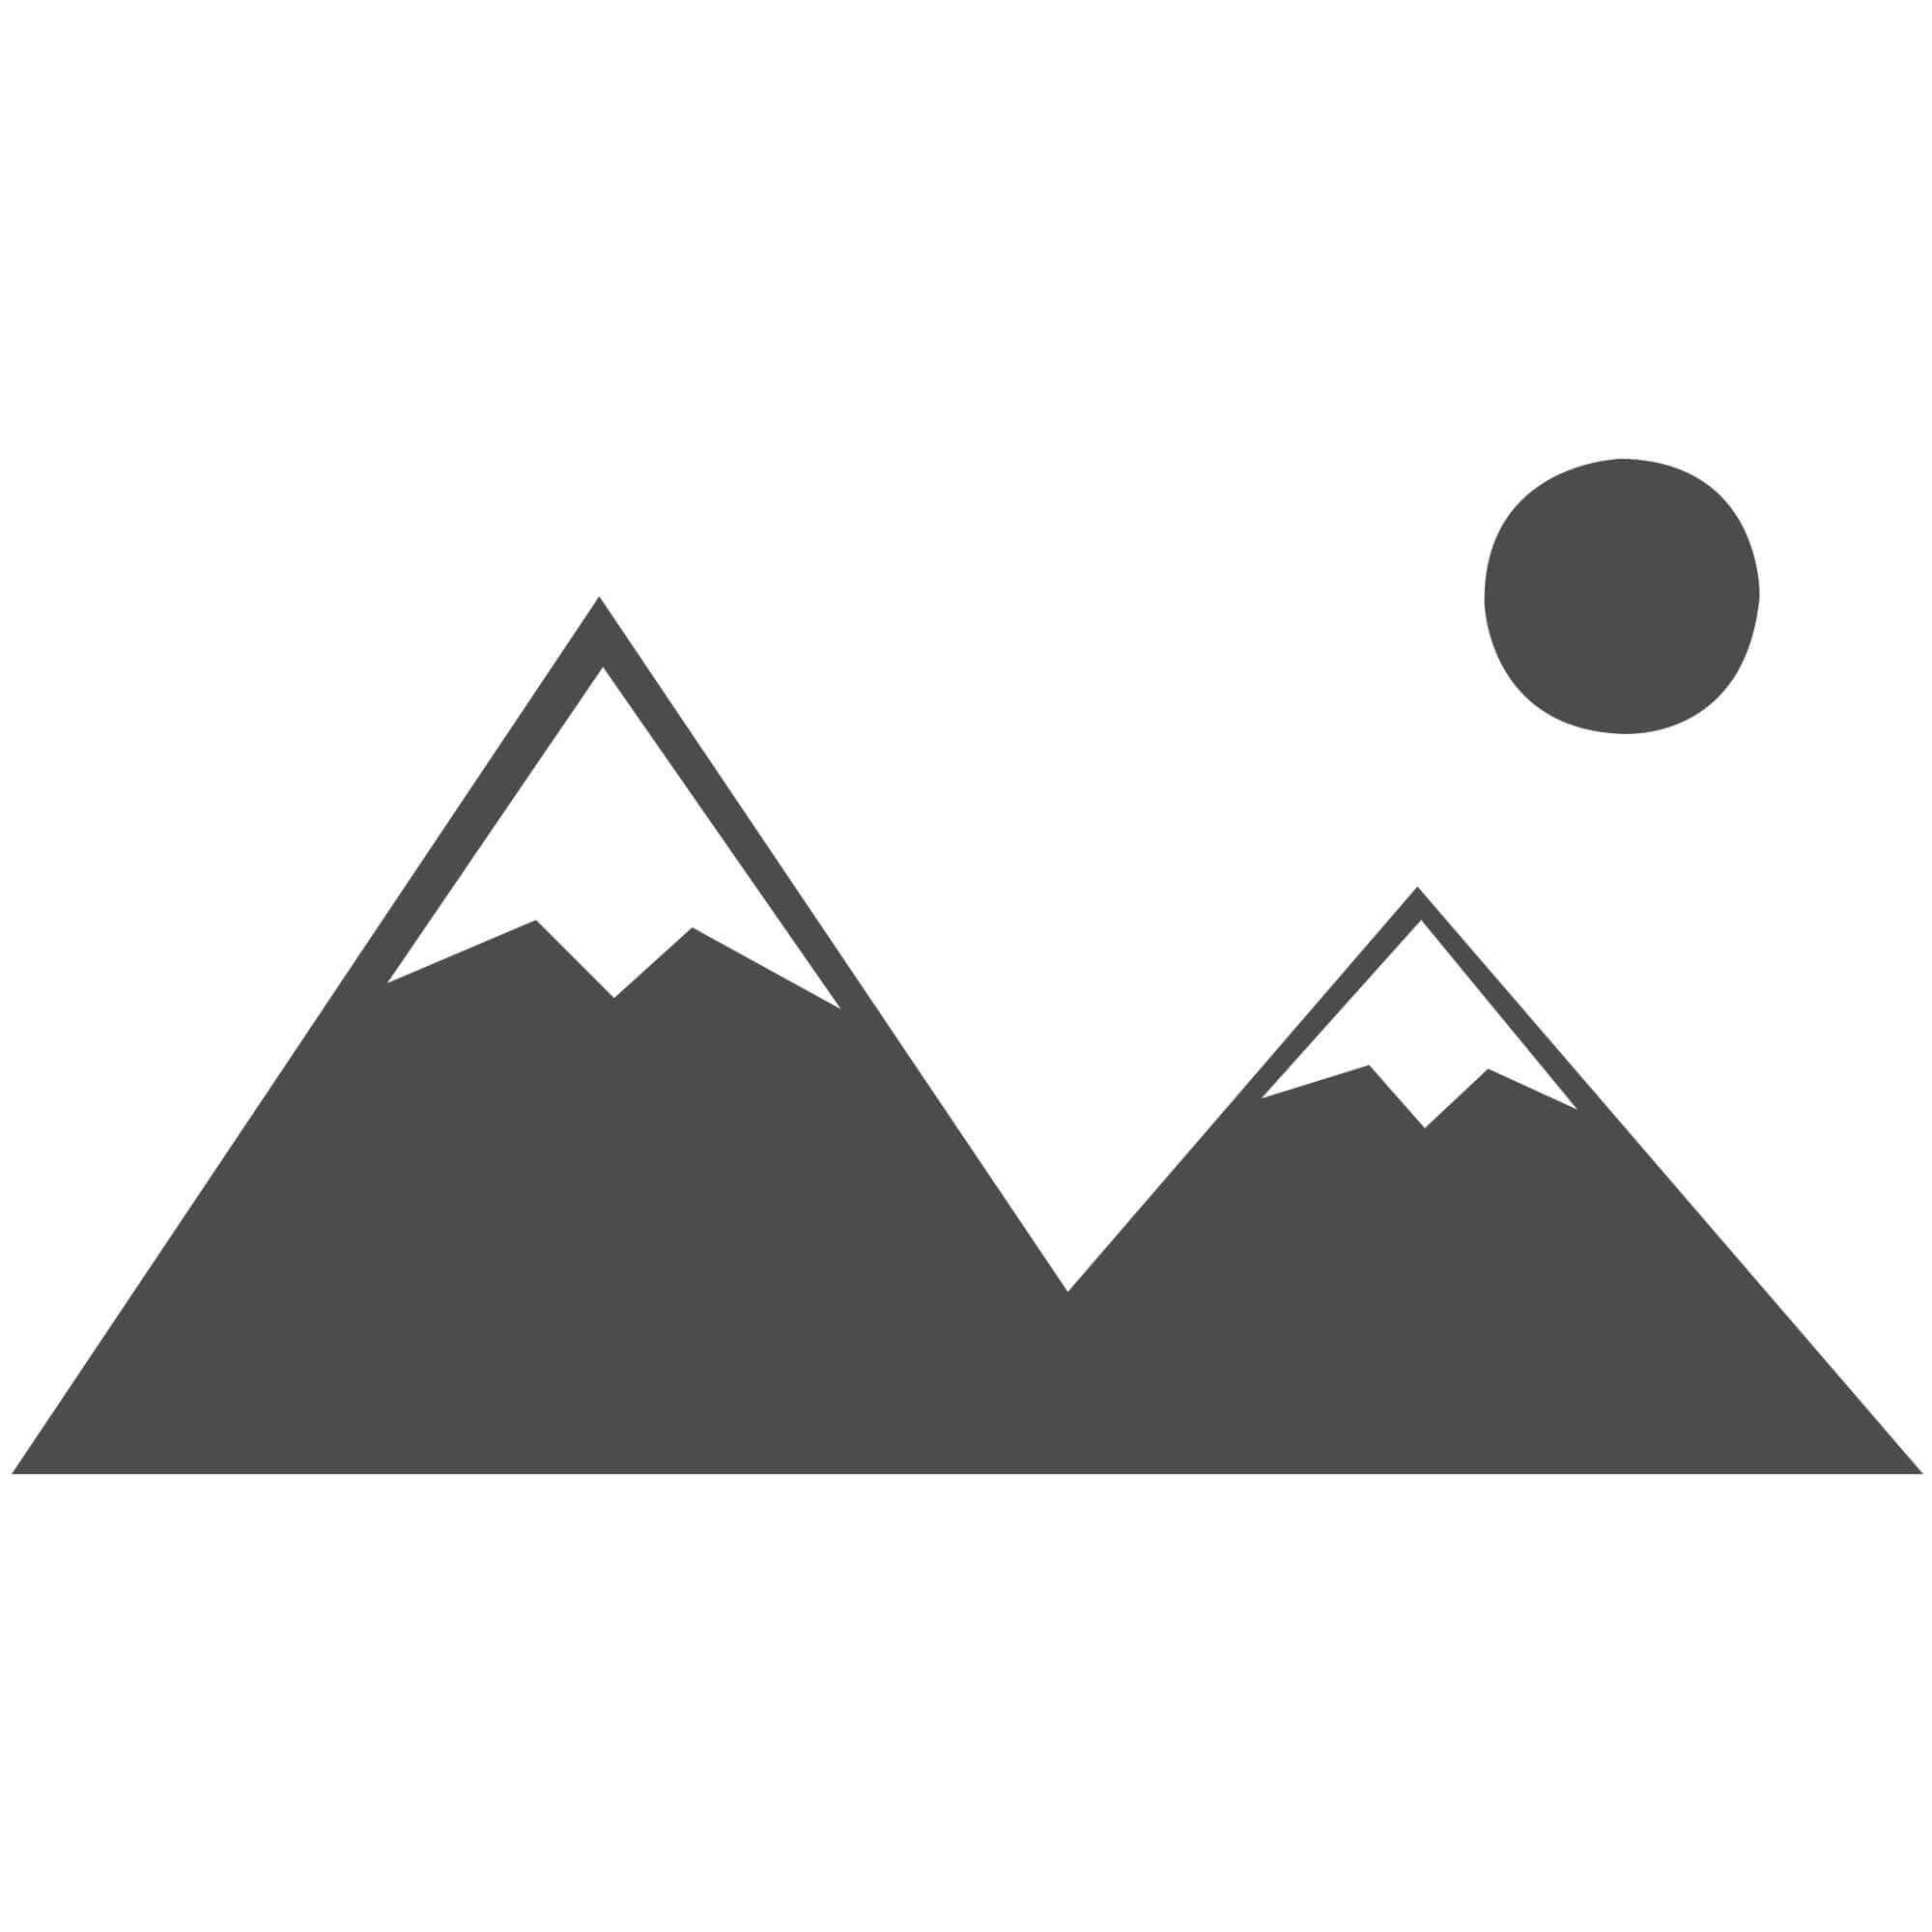 "Velvet Shaggy Rug - Ochre Yellow - Size 80 x 150 cm (2'8"" x 5')"